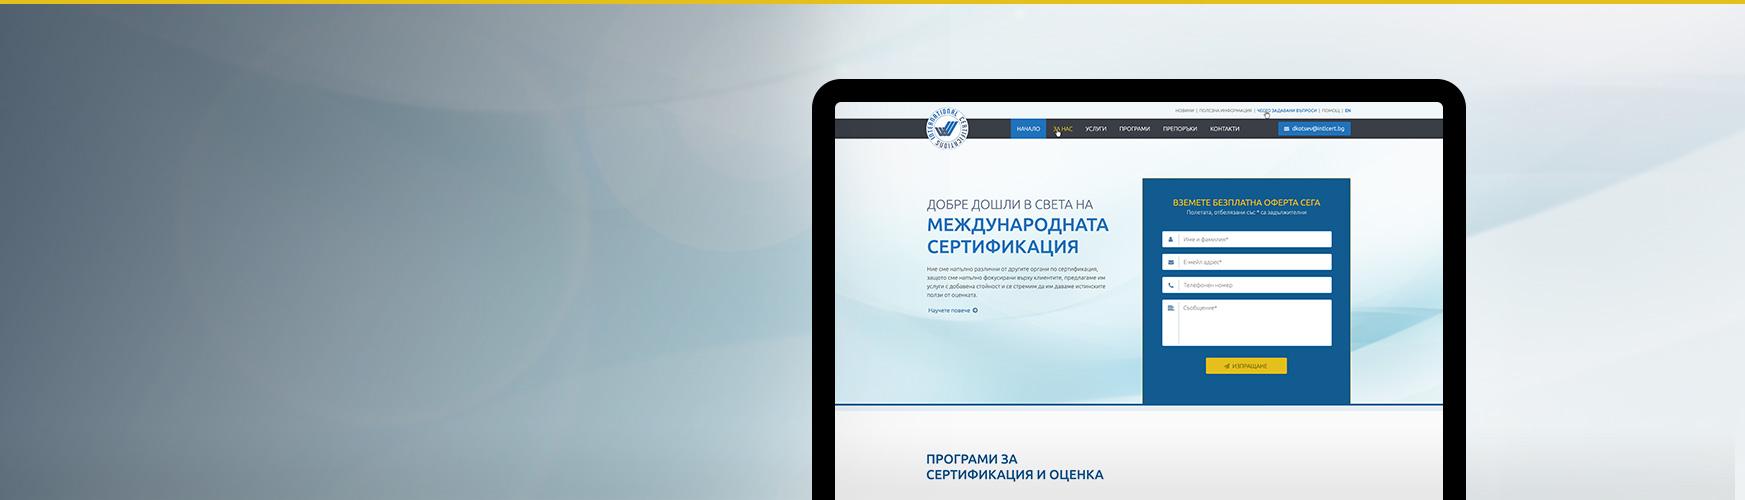 Изработка на WordPress-сайт за Интернешънал Сертификейшънс